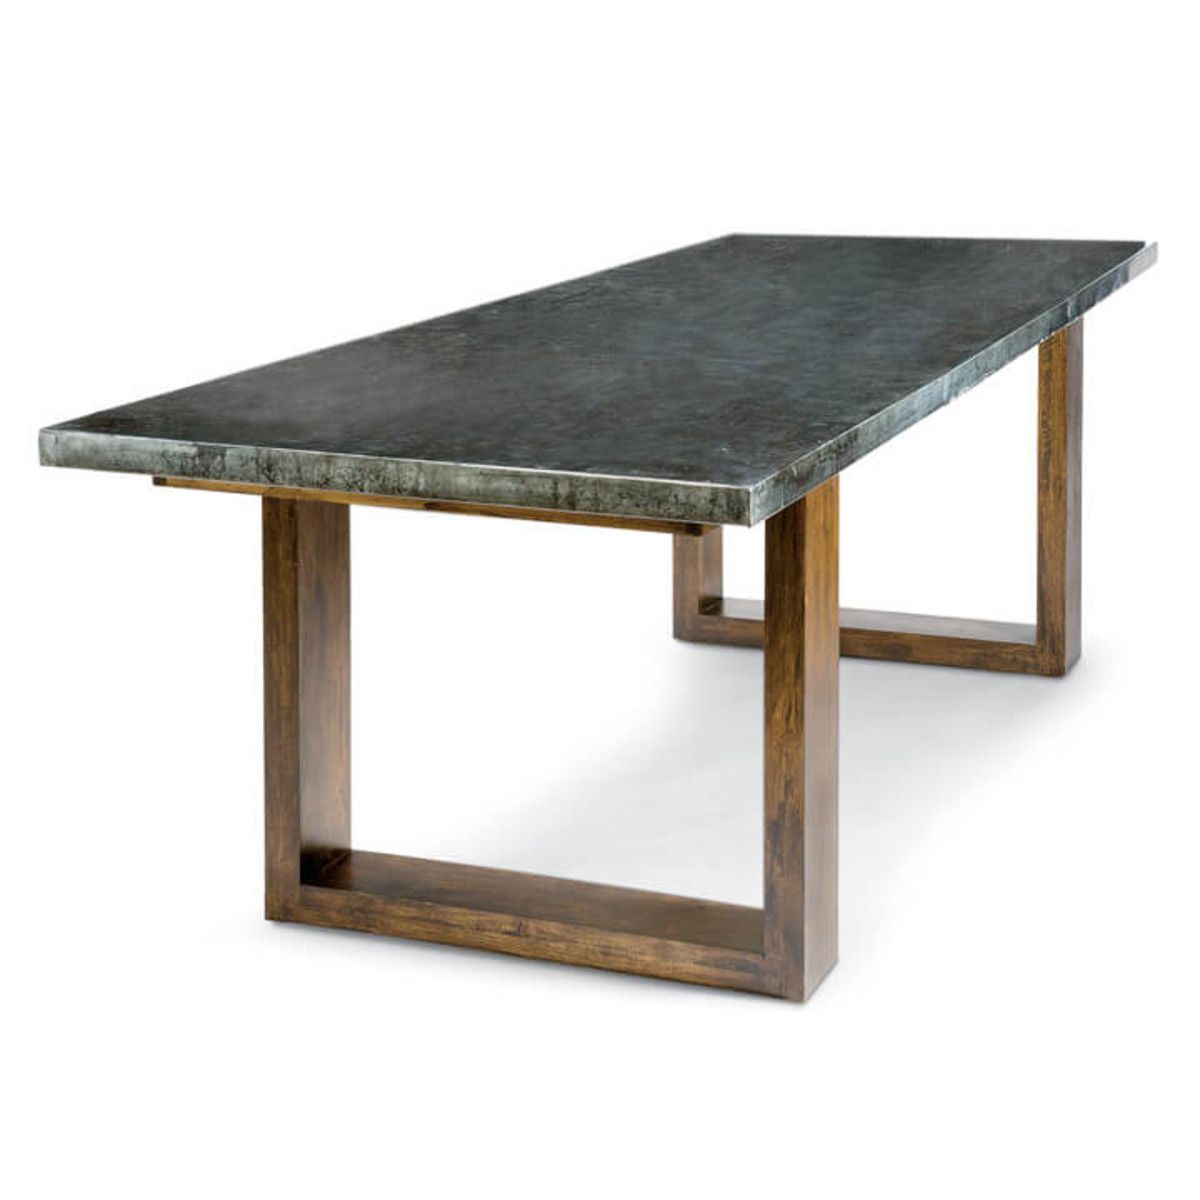 Lfd Zinc Dining Table With Plain Top Zinc Dining Tables Metal Dining Room Dining Table